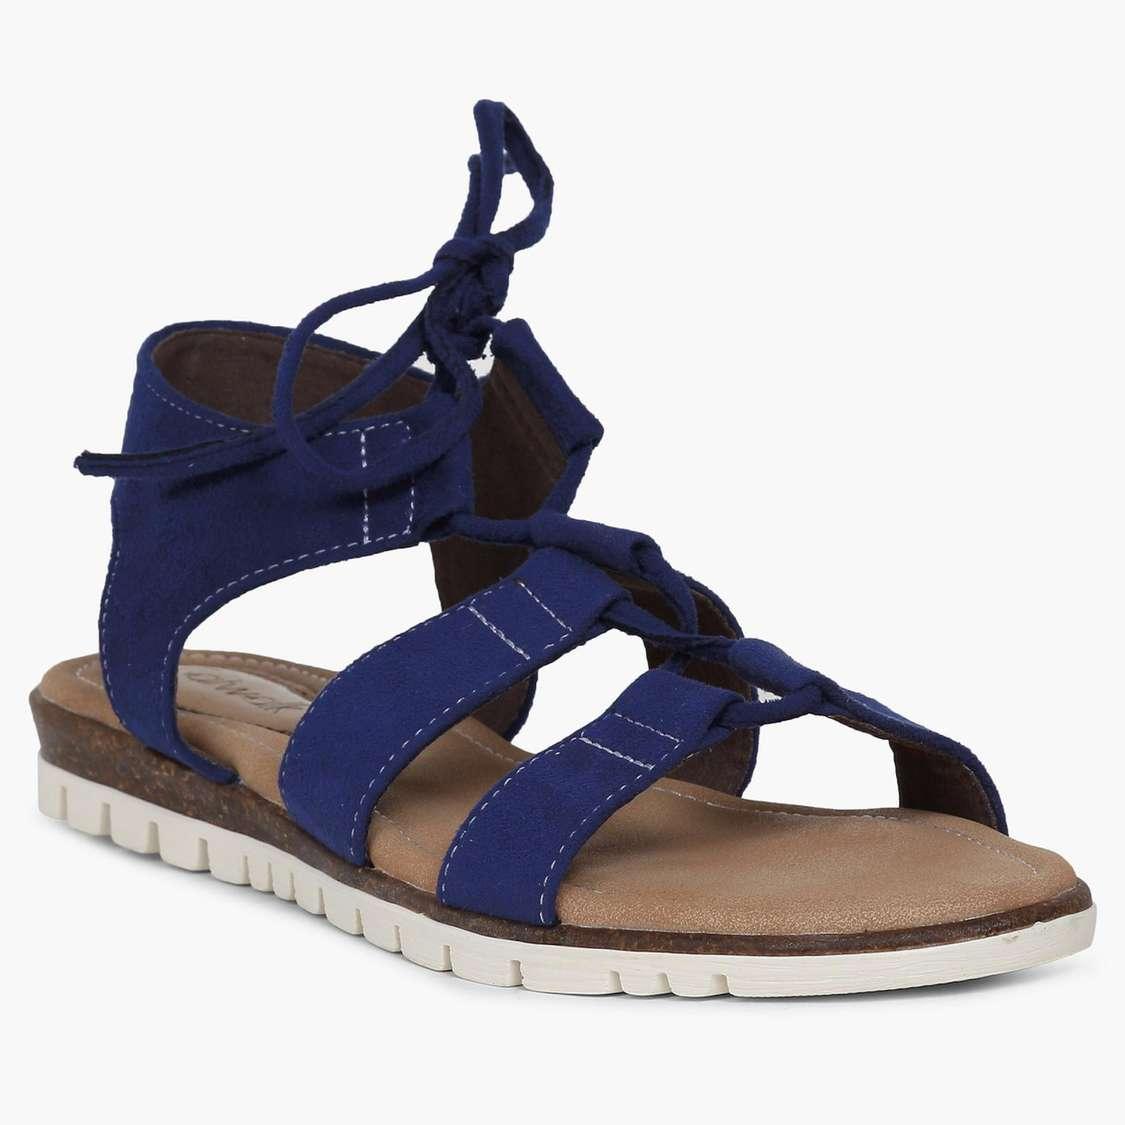 CATWALK Gladiator Sandals